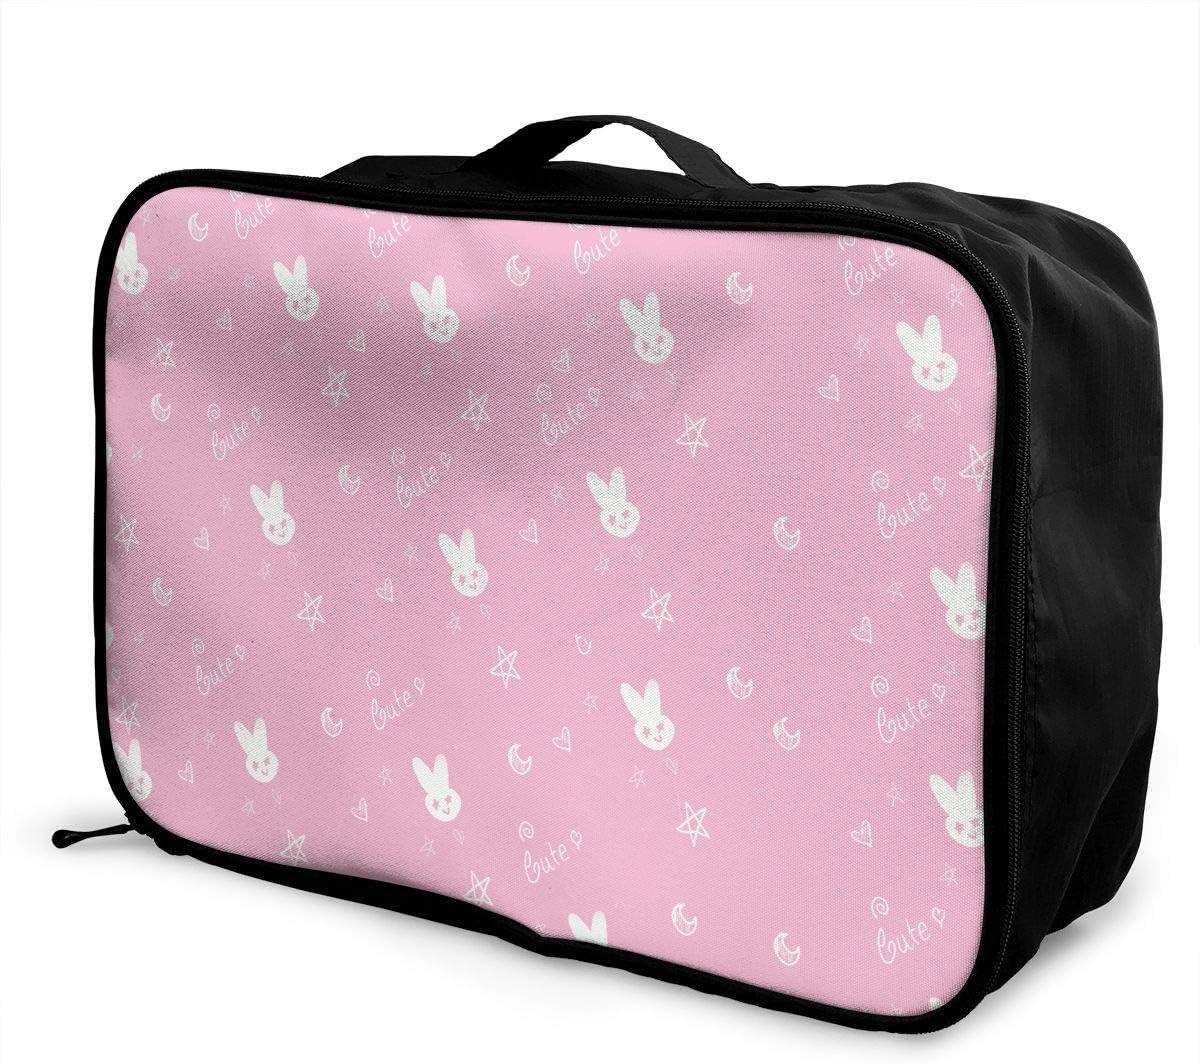 Cute Pink Baby Travel Carry-on Luggage Weekender Bag Overnight Tote Flight Duffel In Trolley Handle